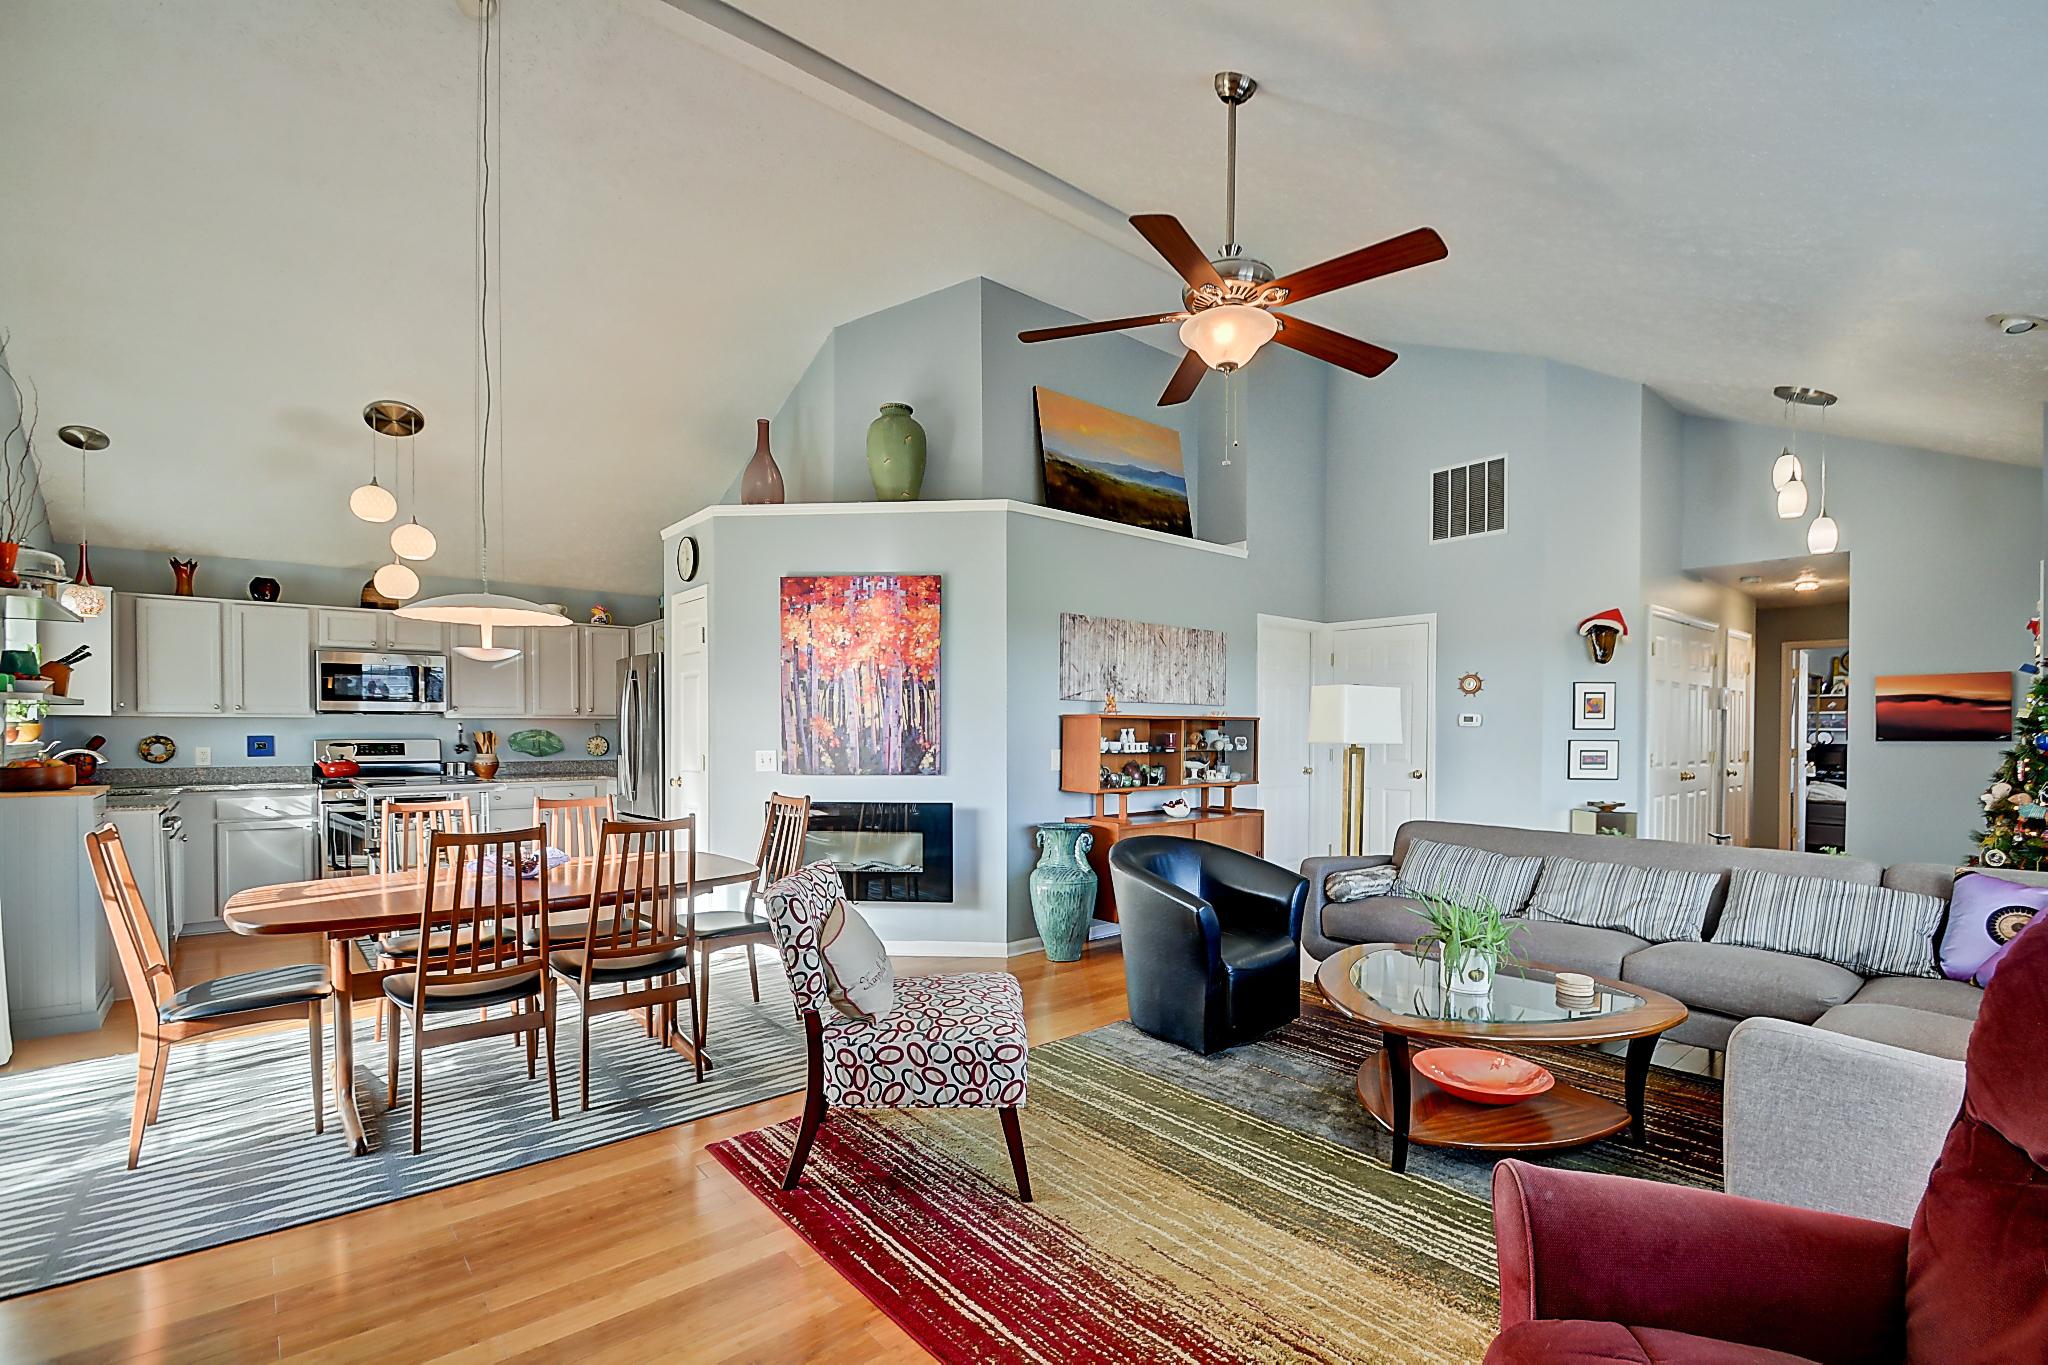 5-Living Room View 2.jpg